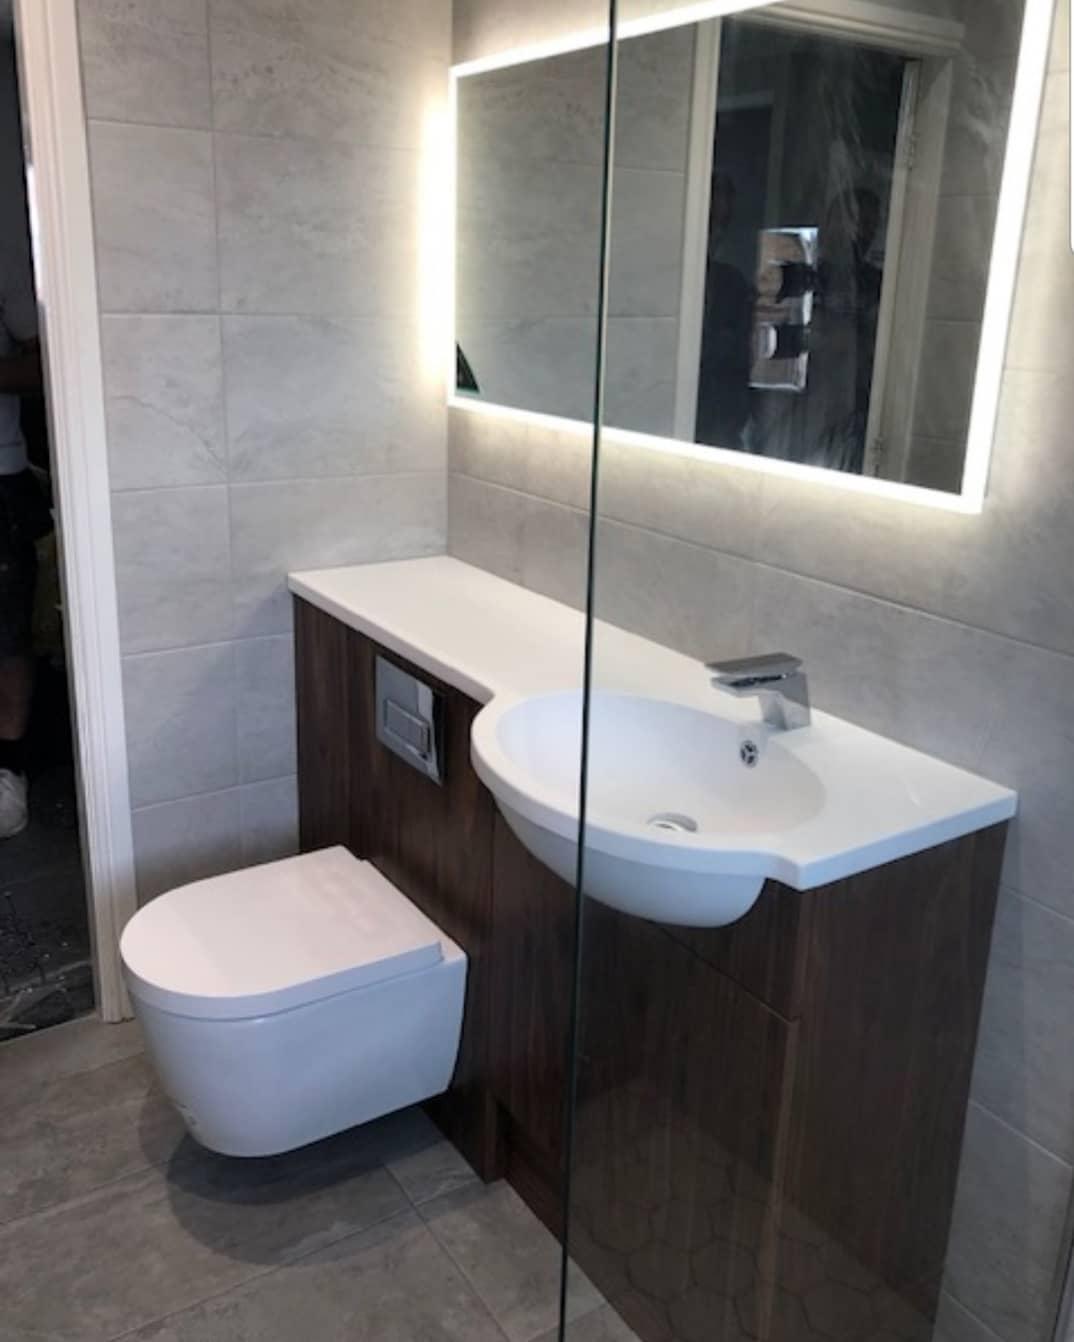 illuminated HIB mirror in this gorgeous grey bathroom